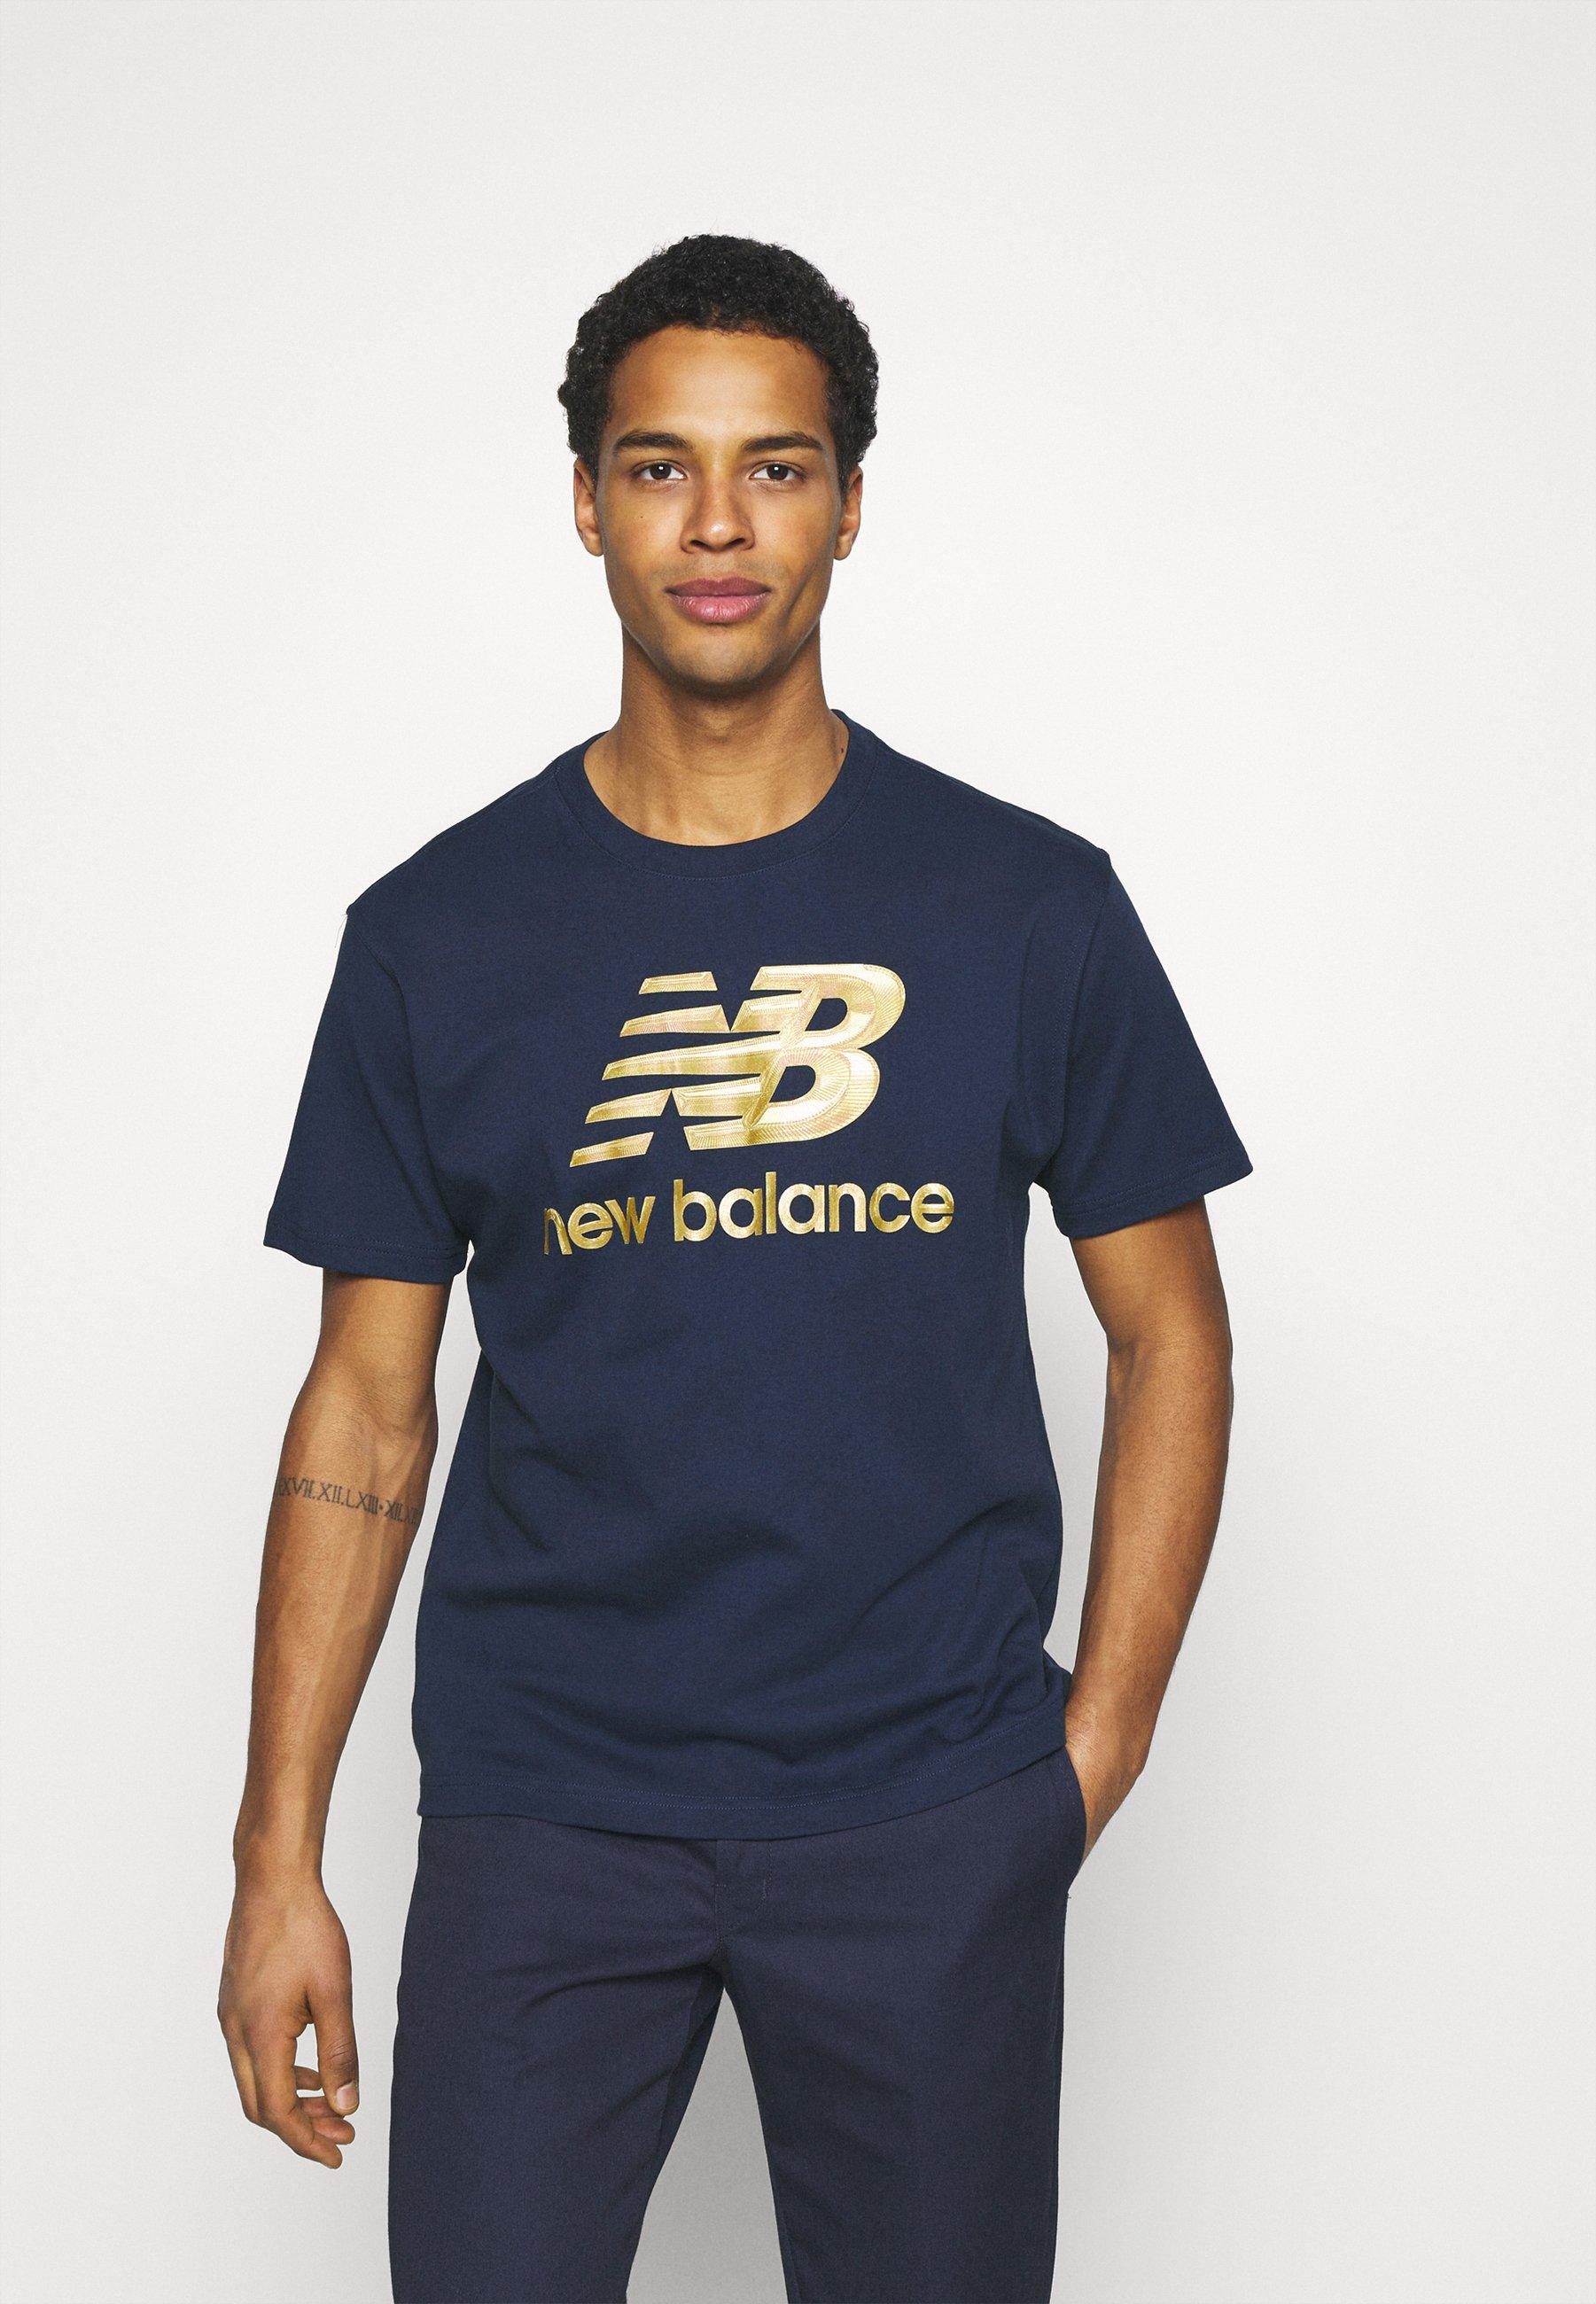 Camiseta estampada NEW BALANCE